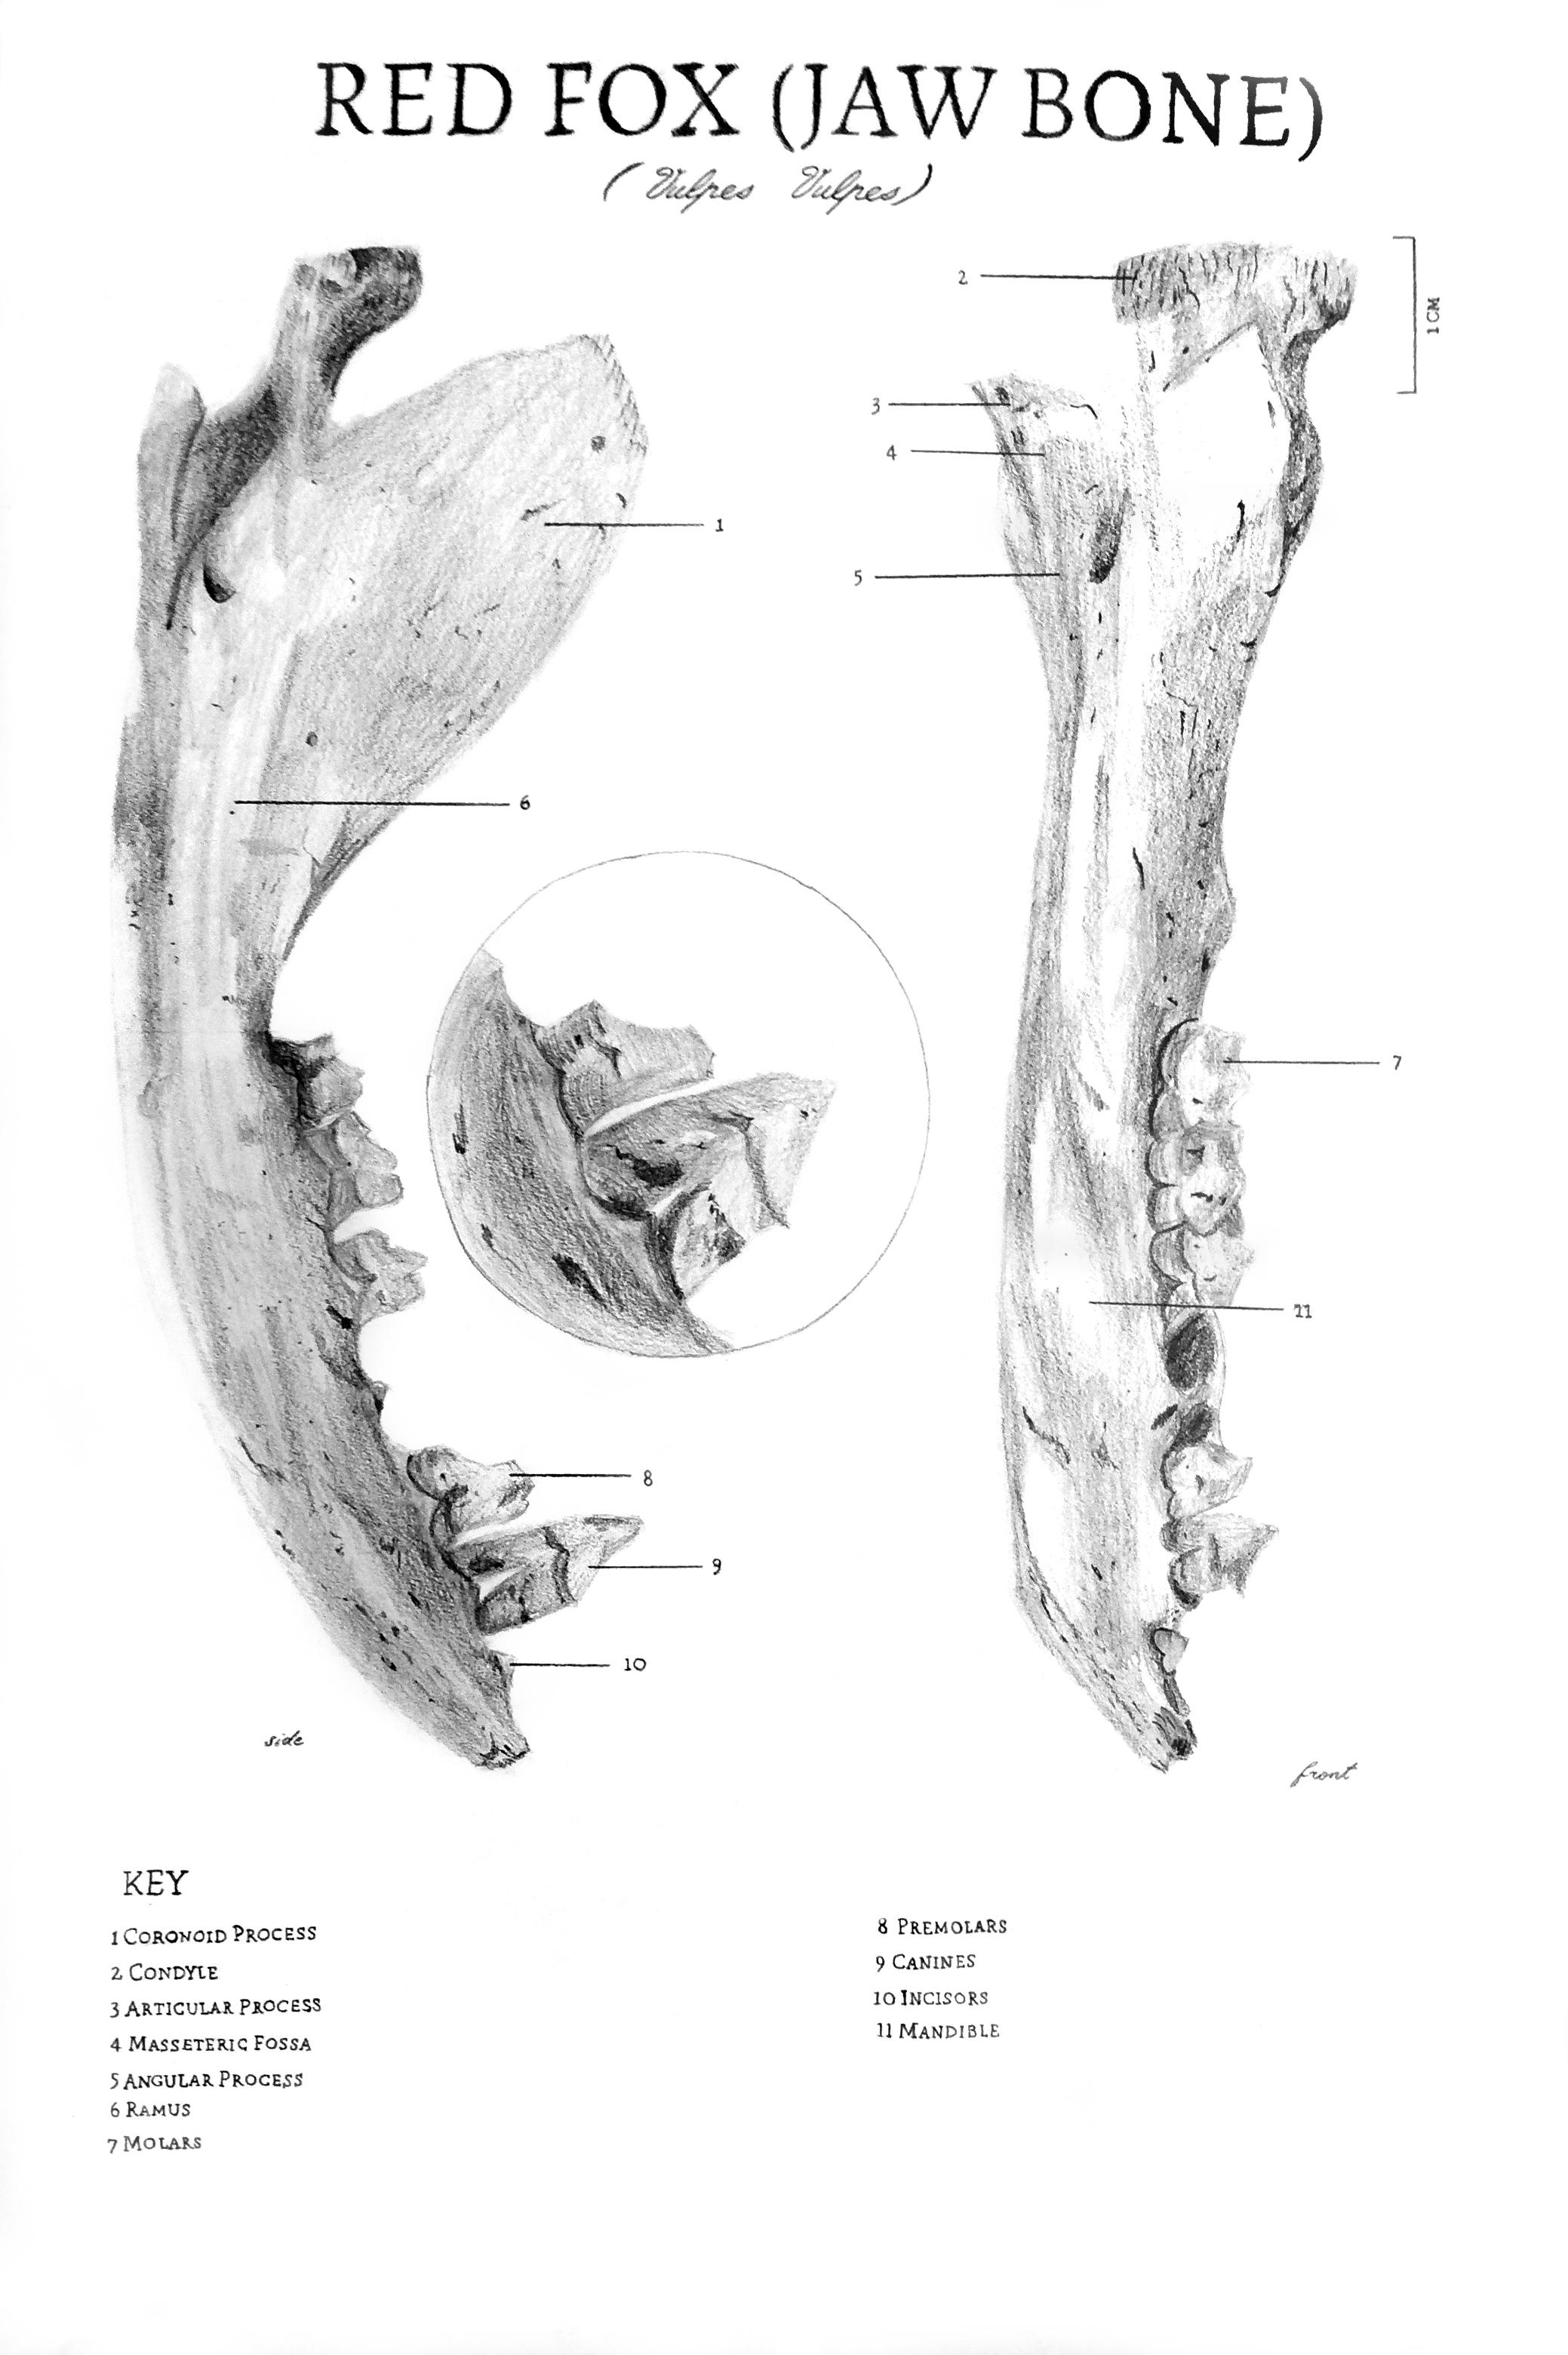 Fox Bone Scientific Illustration